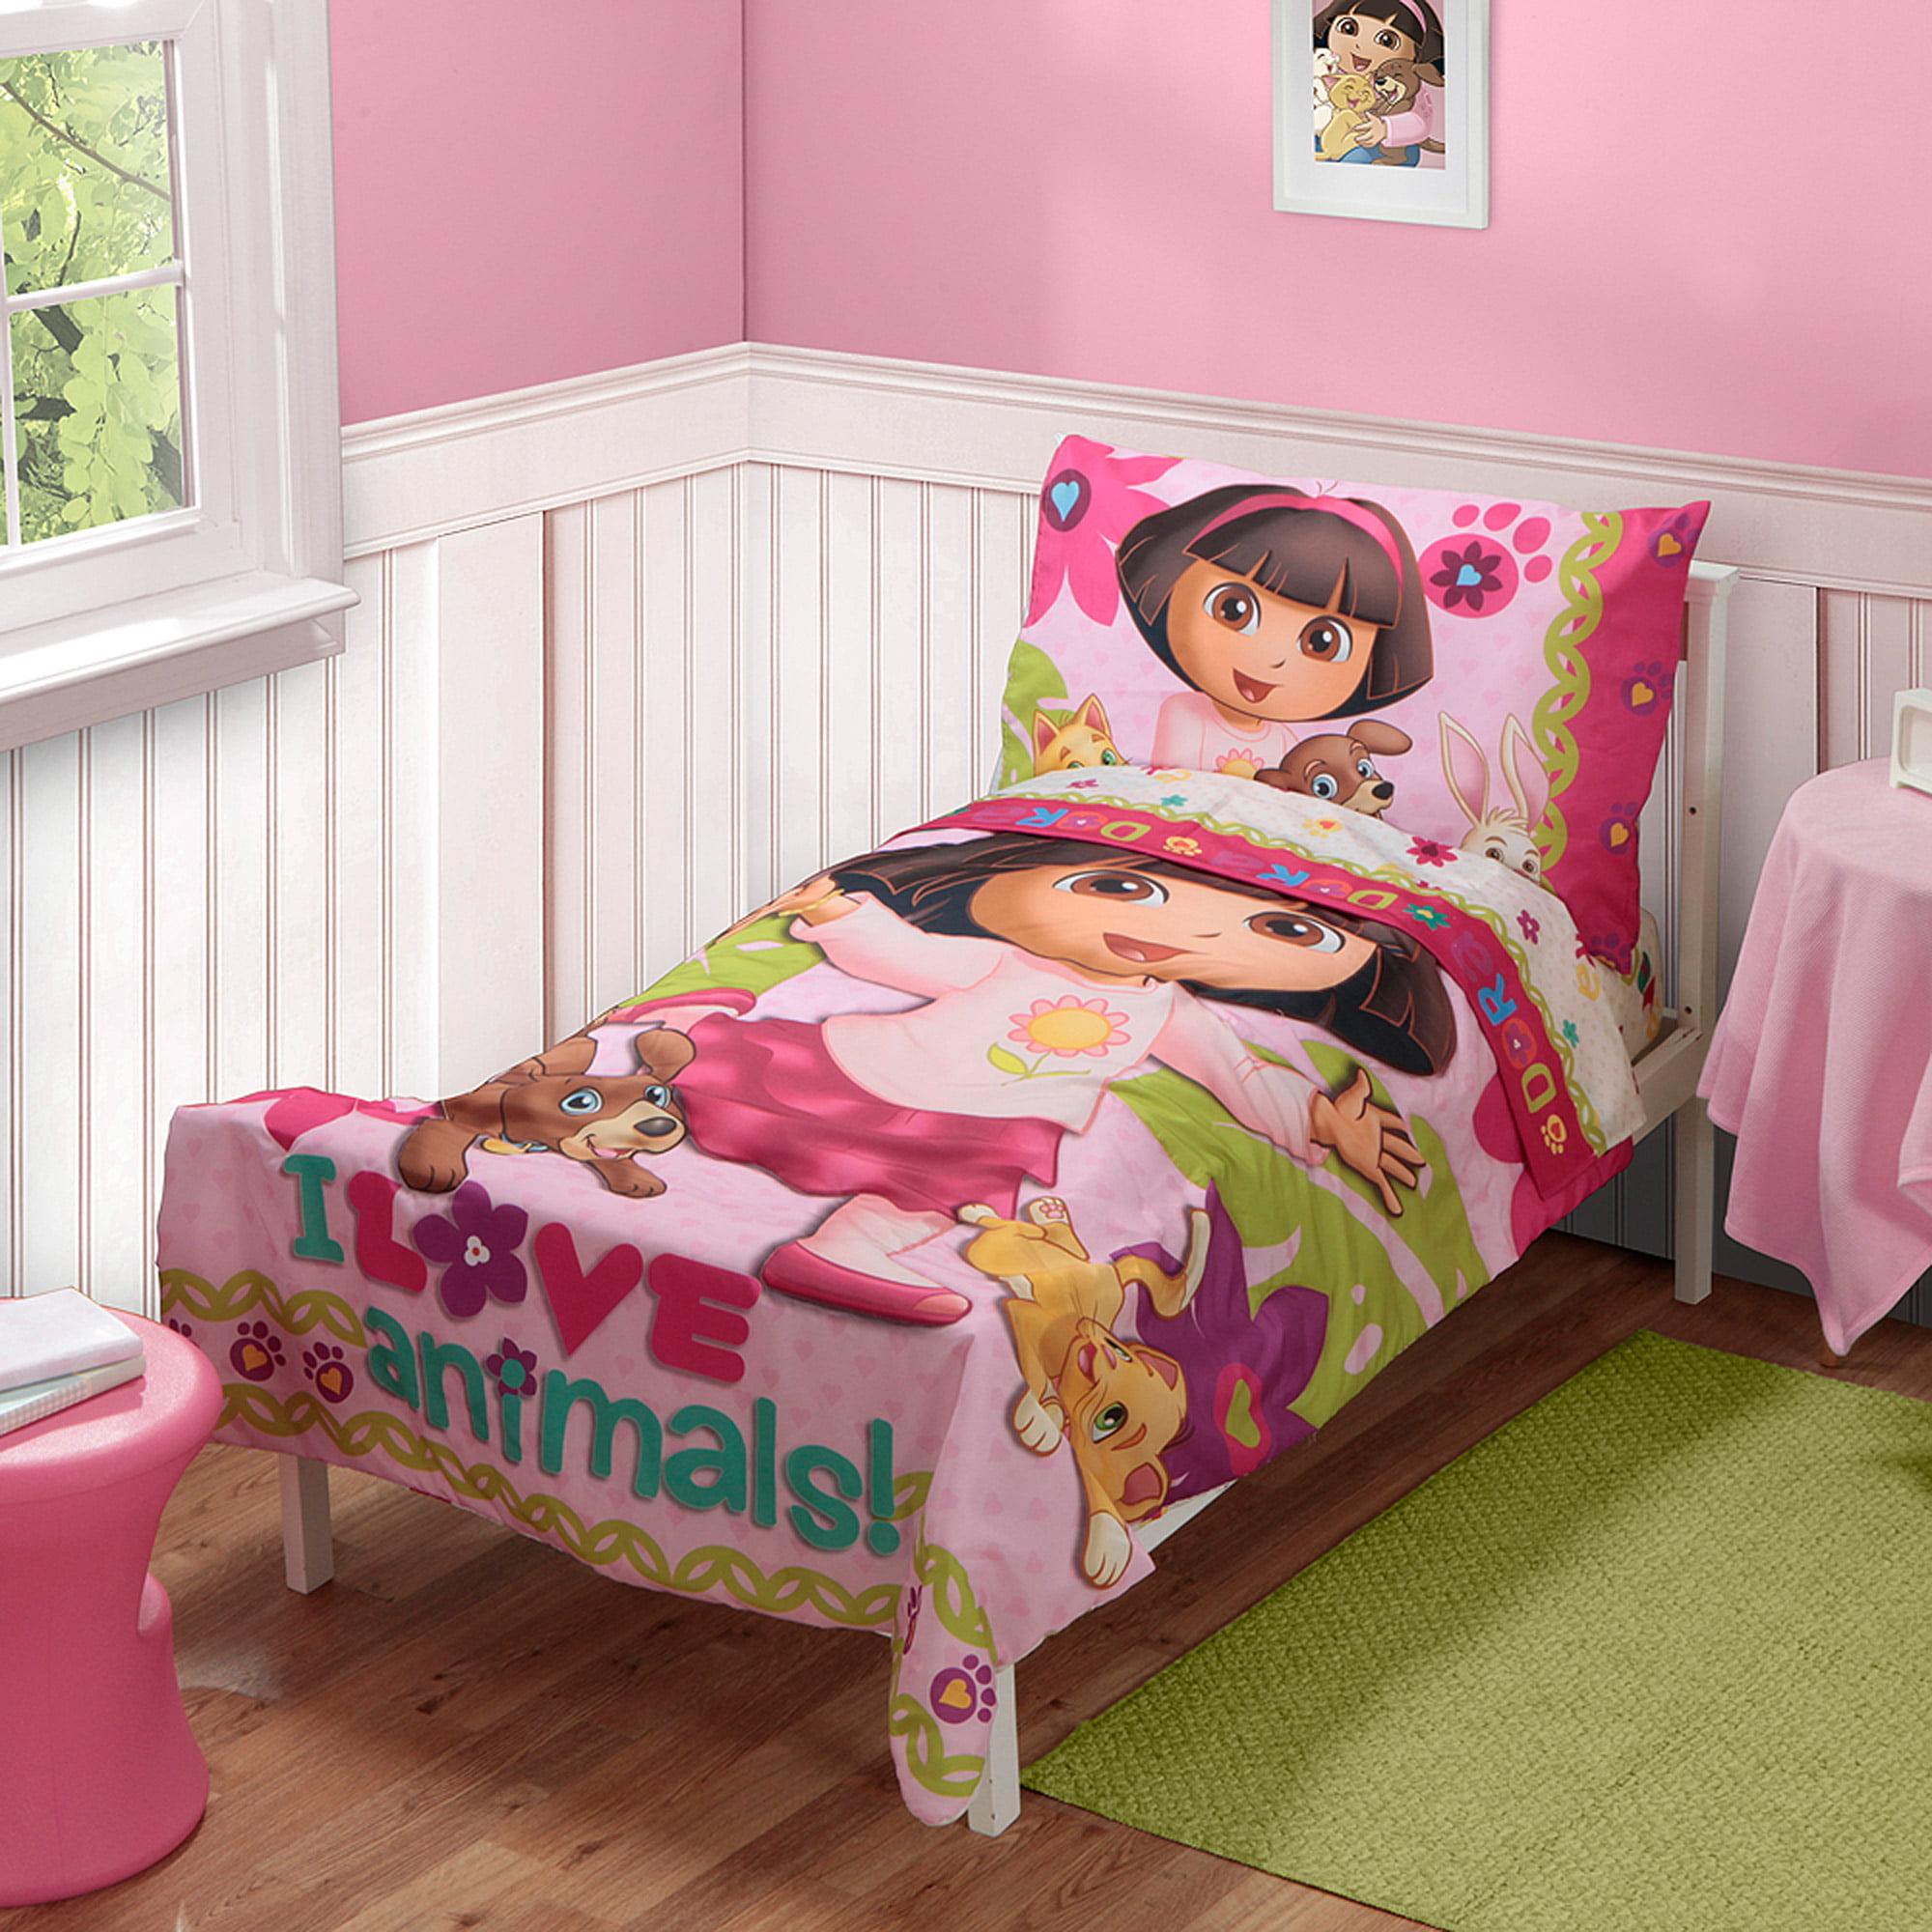 Nickelodeon - Dora the Explorer Pets 3pc Toddler Bedding Set with BONUS Matching Pillow Case